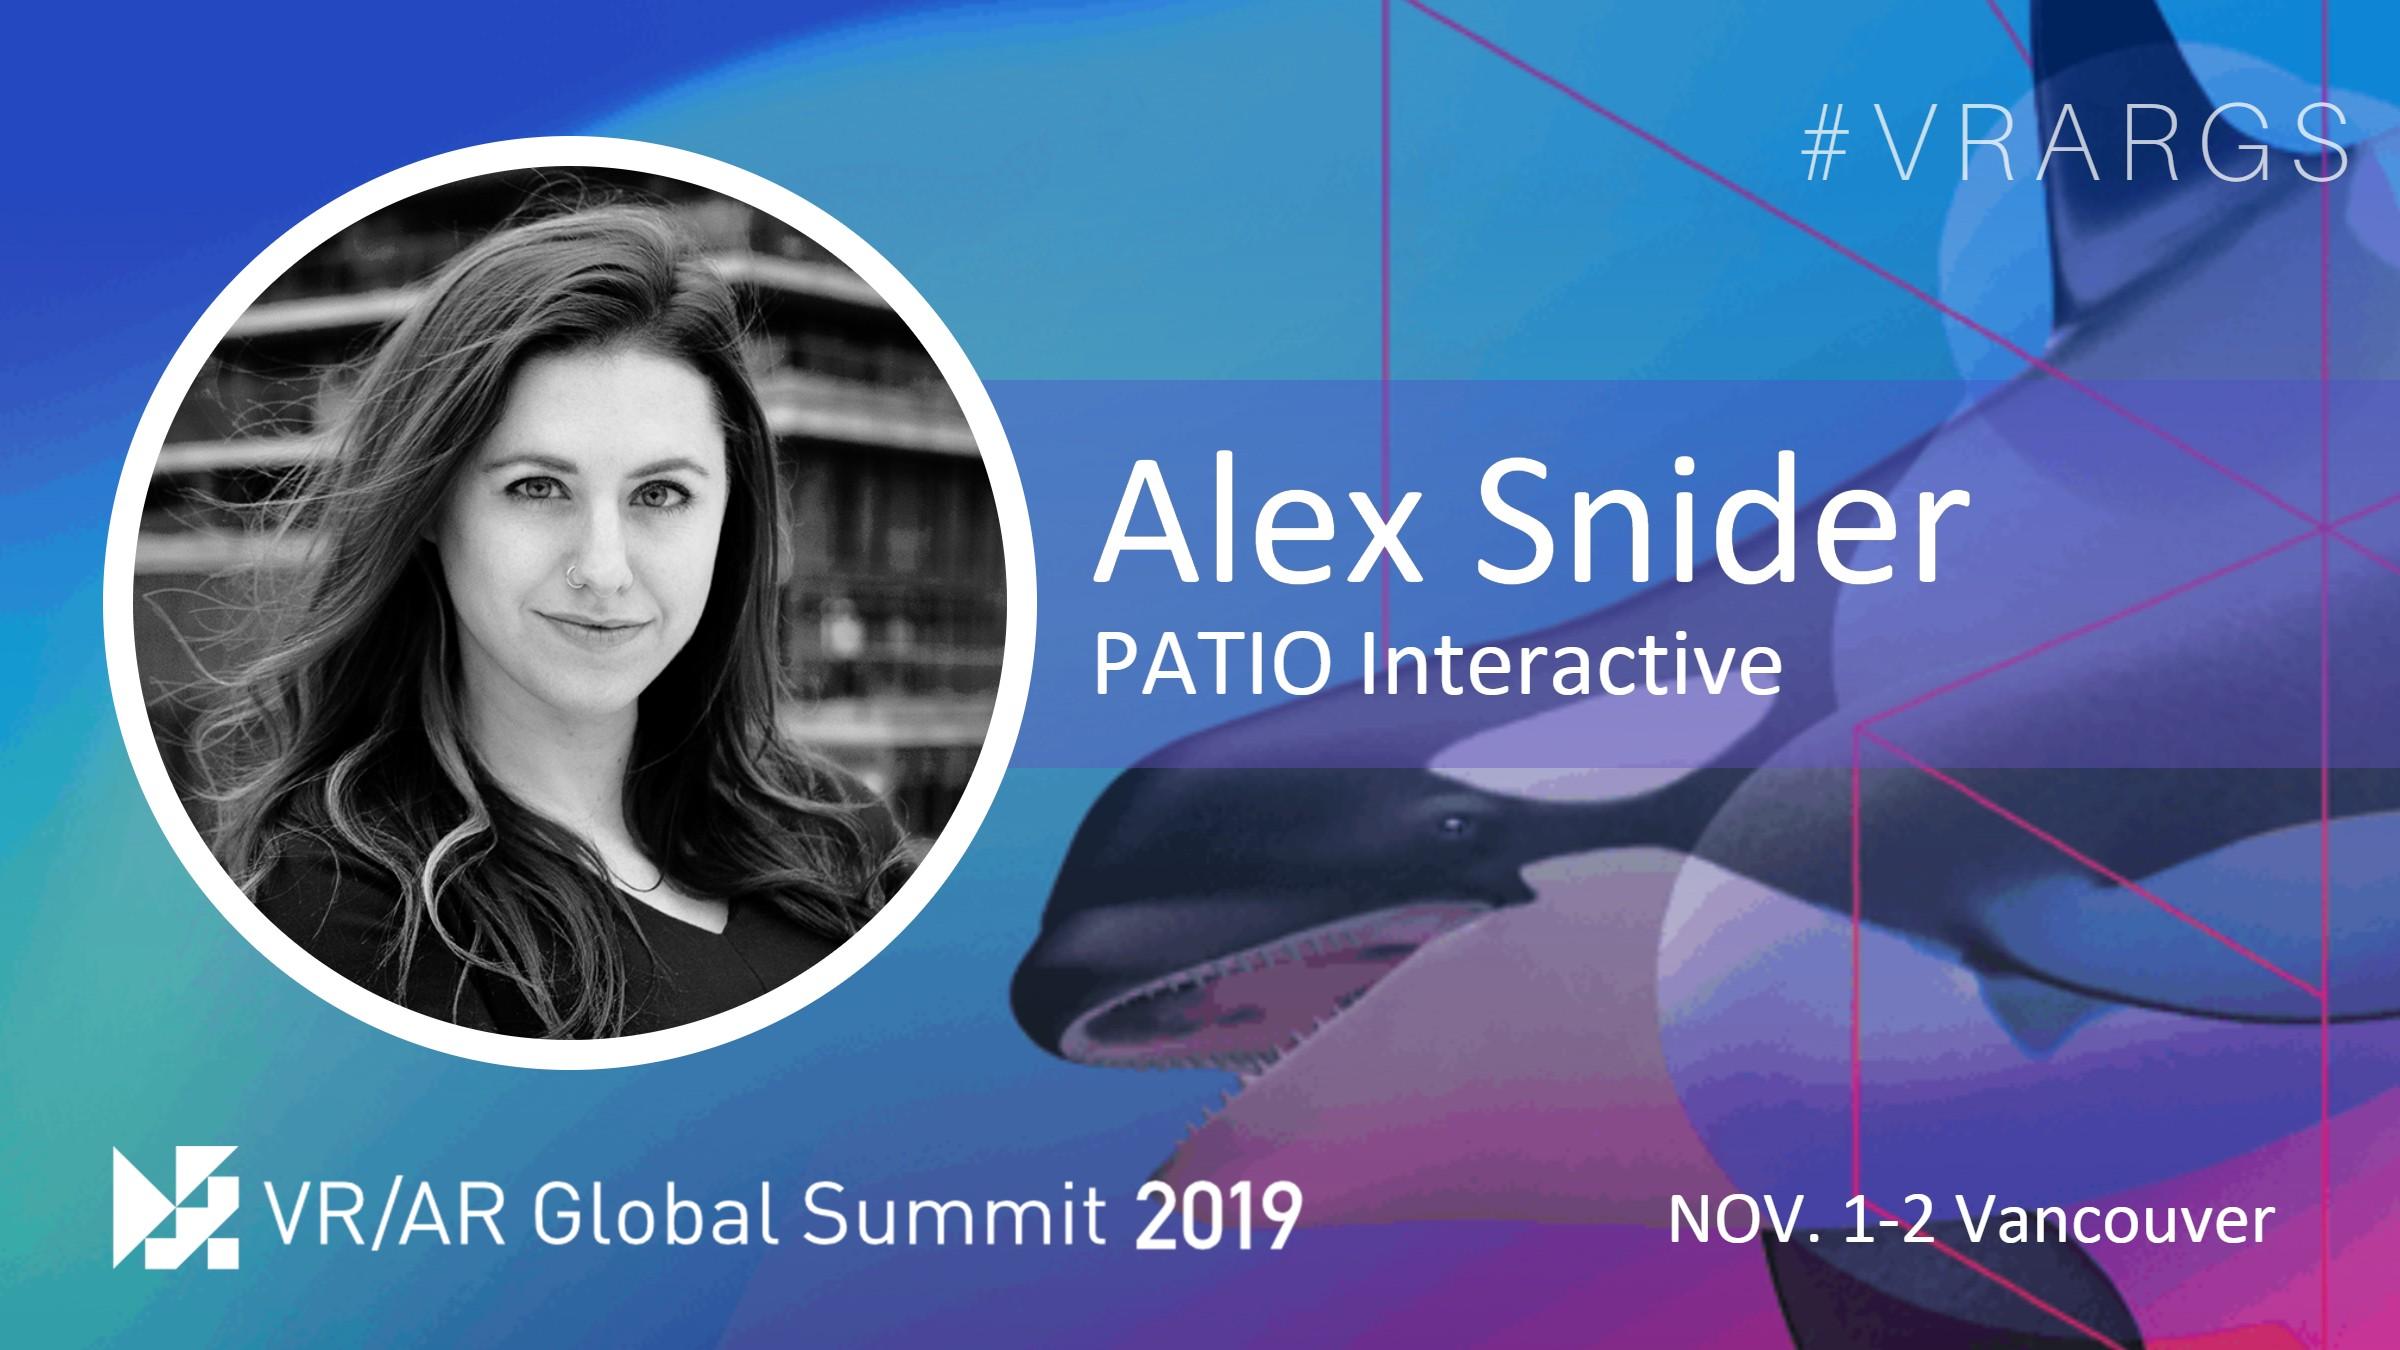 HighRes-ALEX-SNIDER-Patio-Interactive-VRARGS-VRAR-Global-Summit-Spatial-Computing-Vancouver.jpg